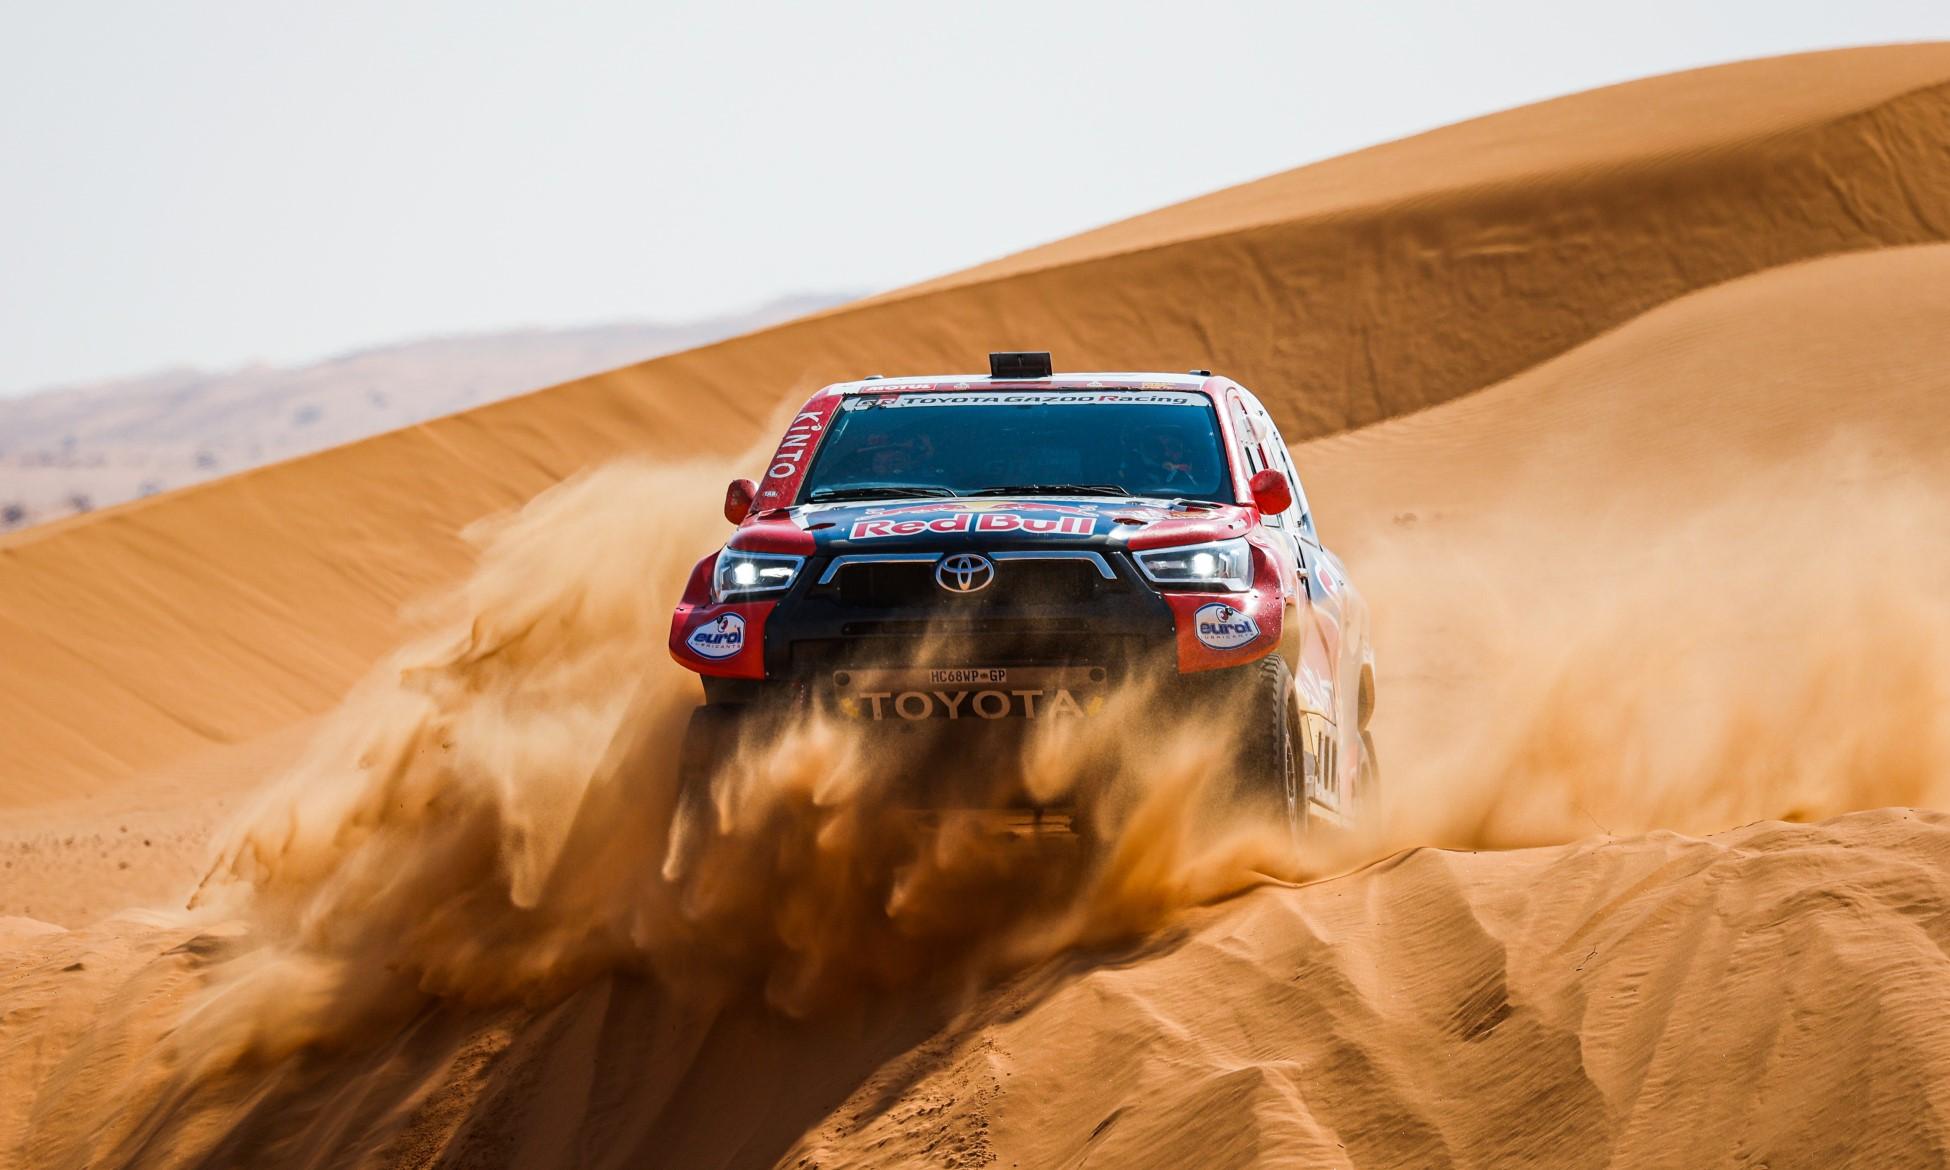 Nasser Al-Attiyah took time out of the race leader on 2021 Dakar Stage 6 (Image F.Gooden DPPI)